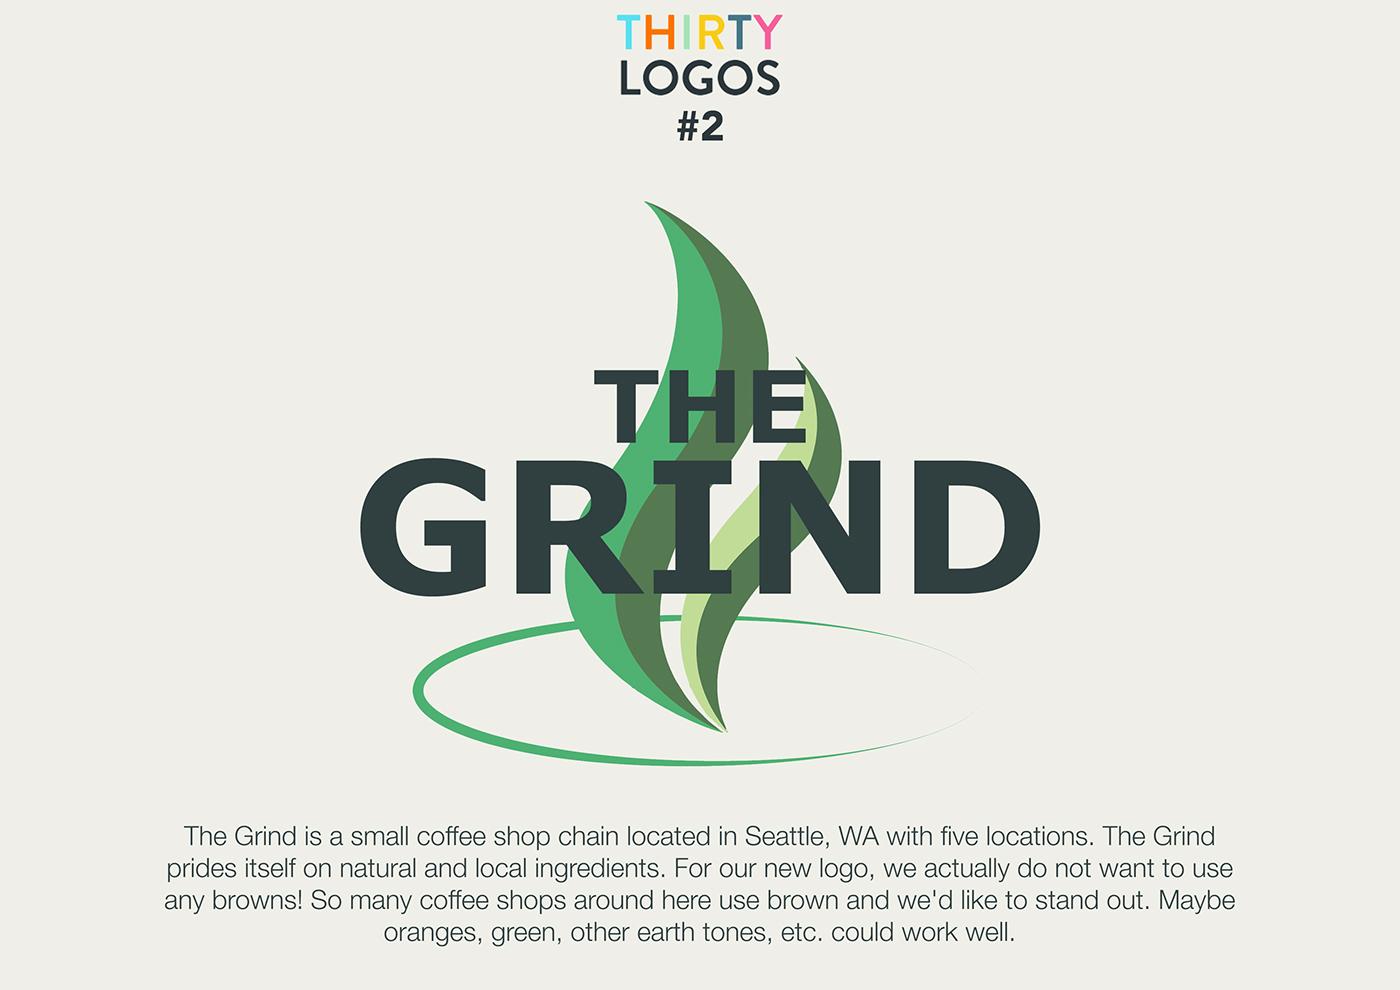 The 30 Logo Challenge